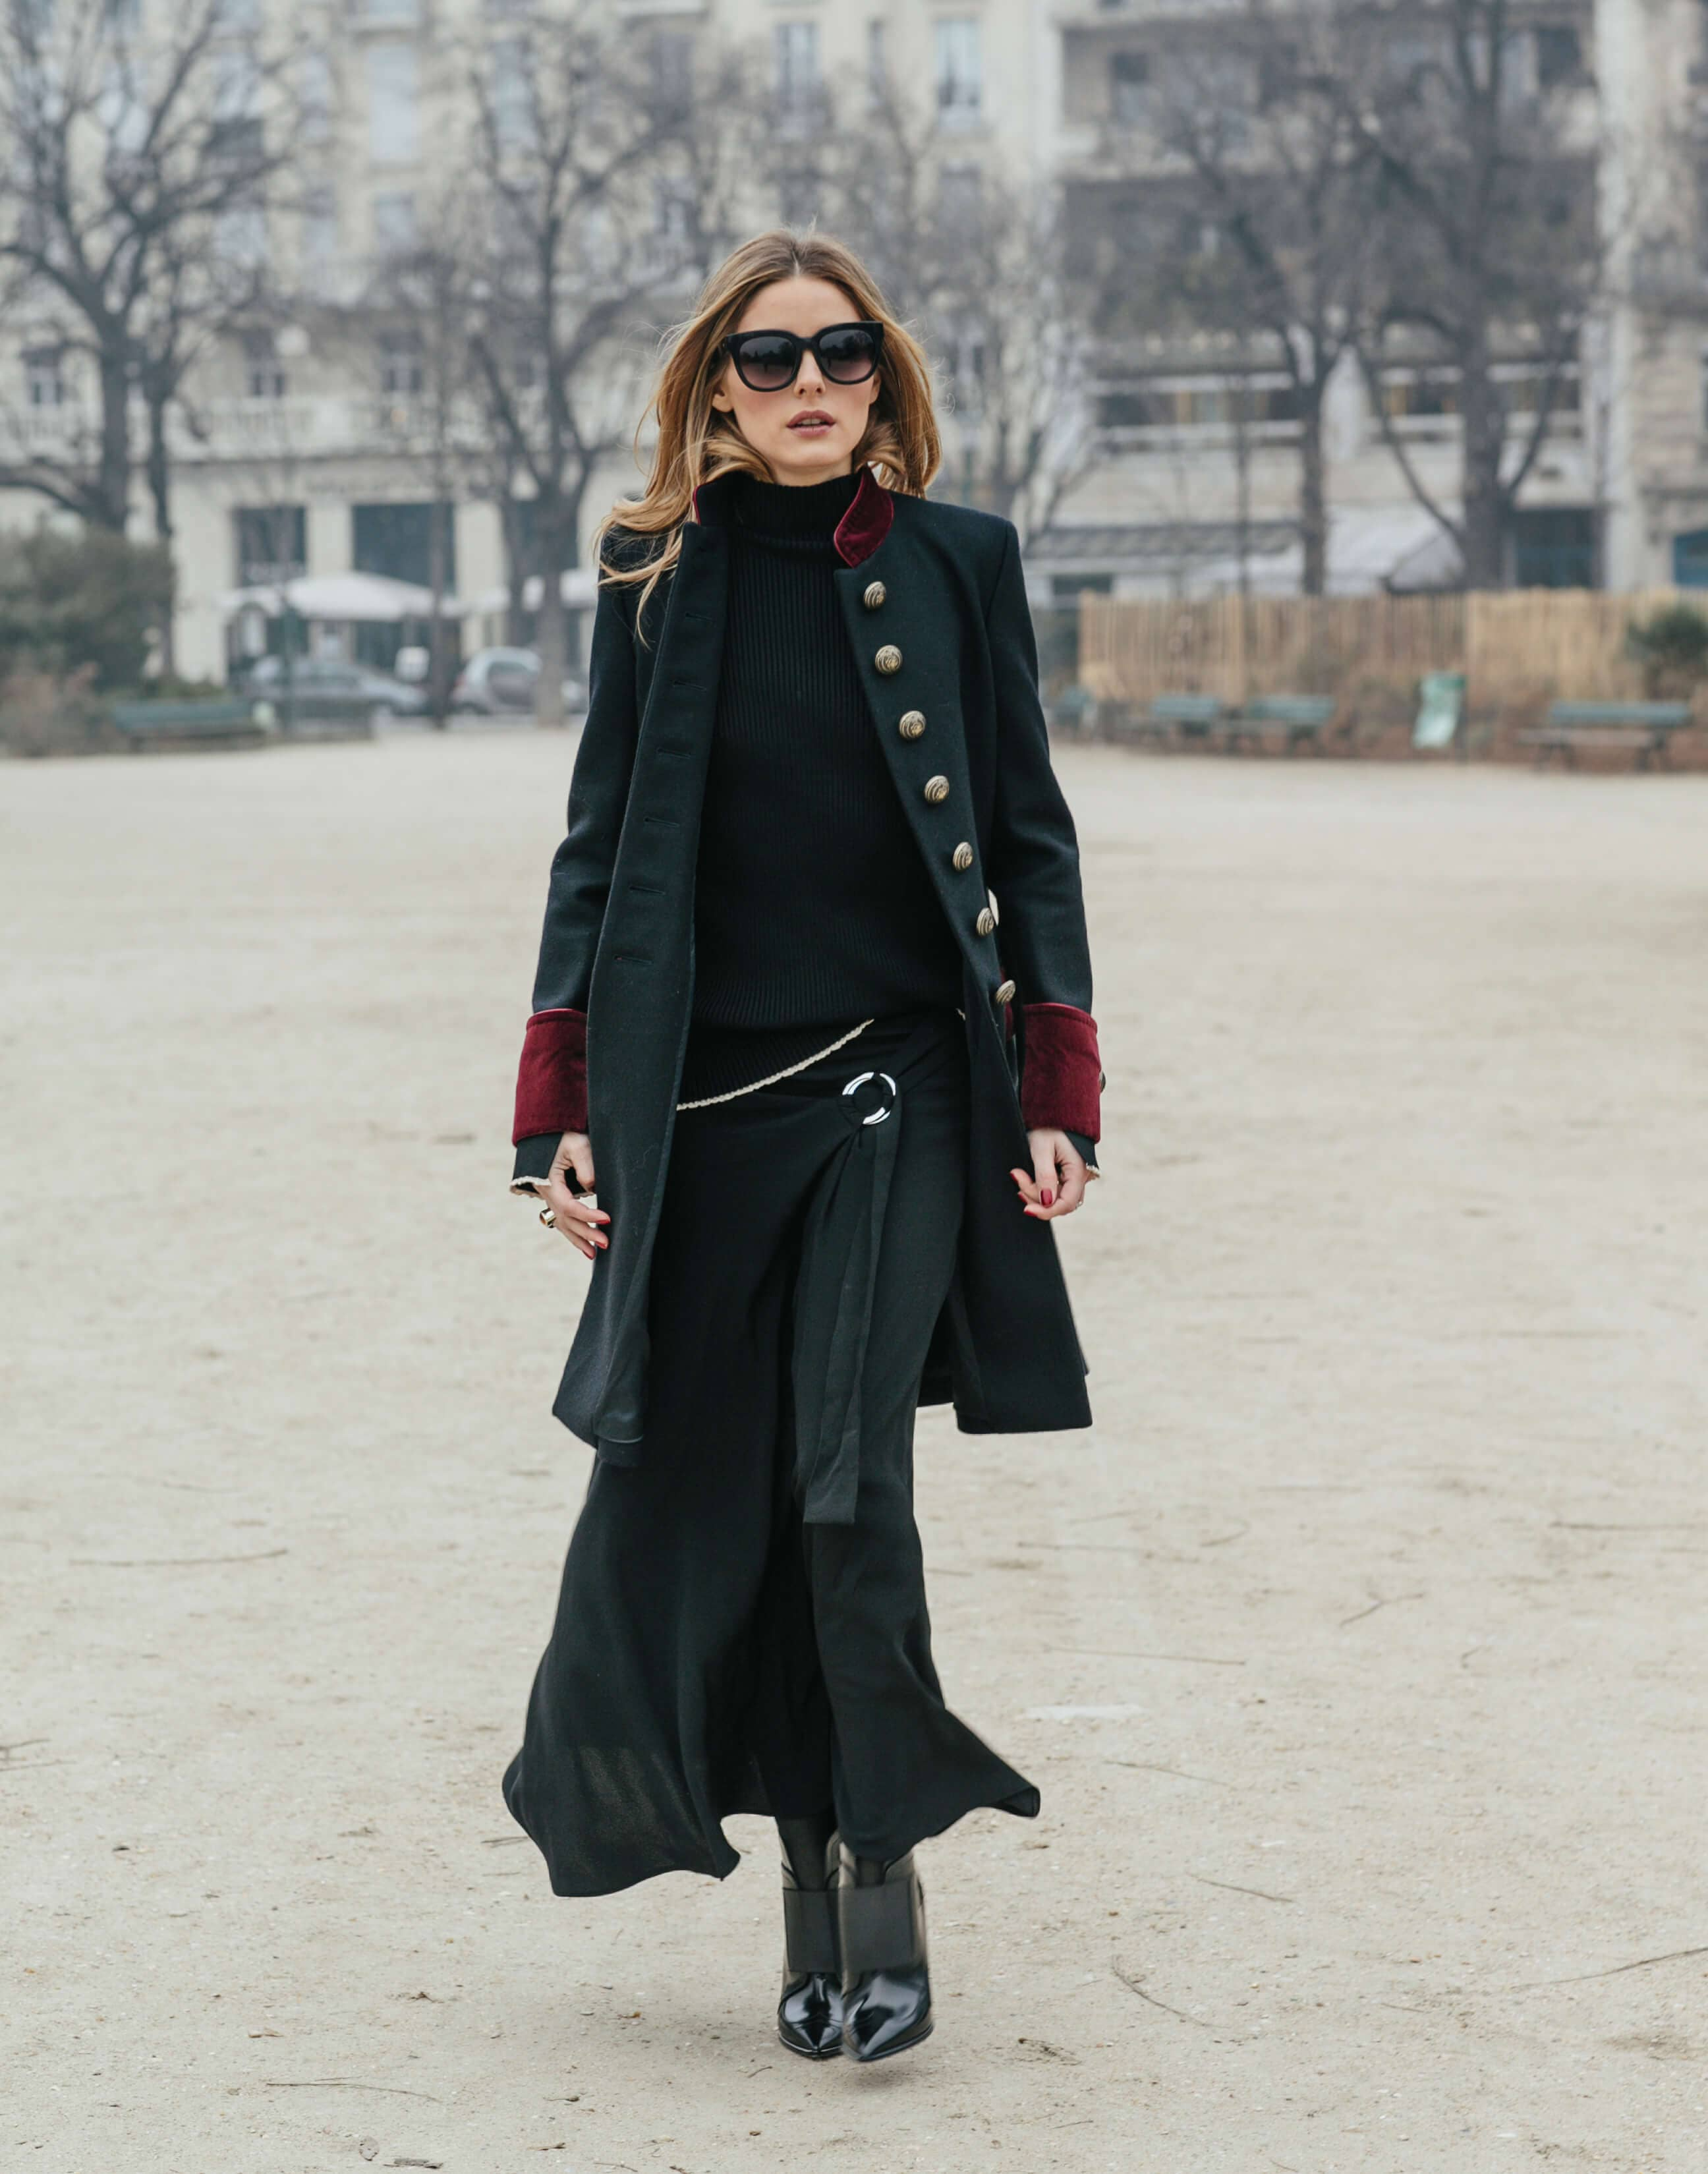 New-age Fashion in Demand